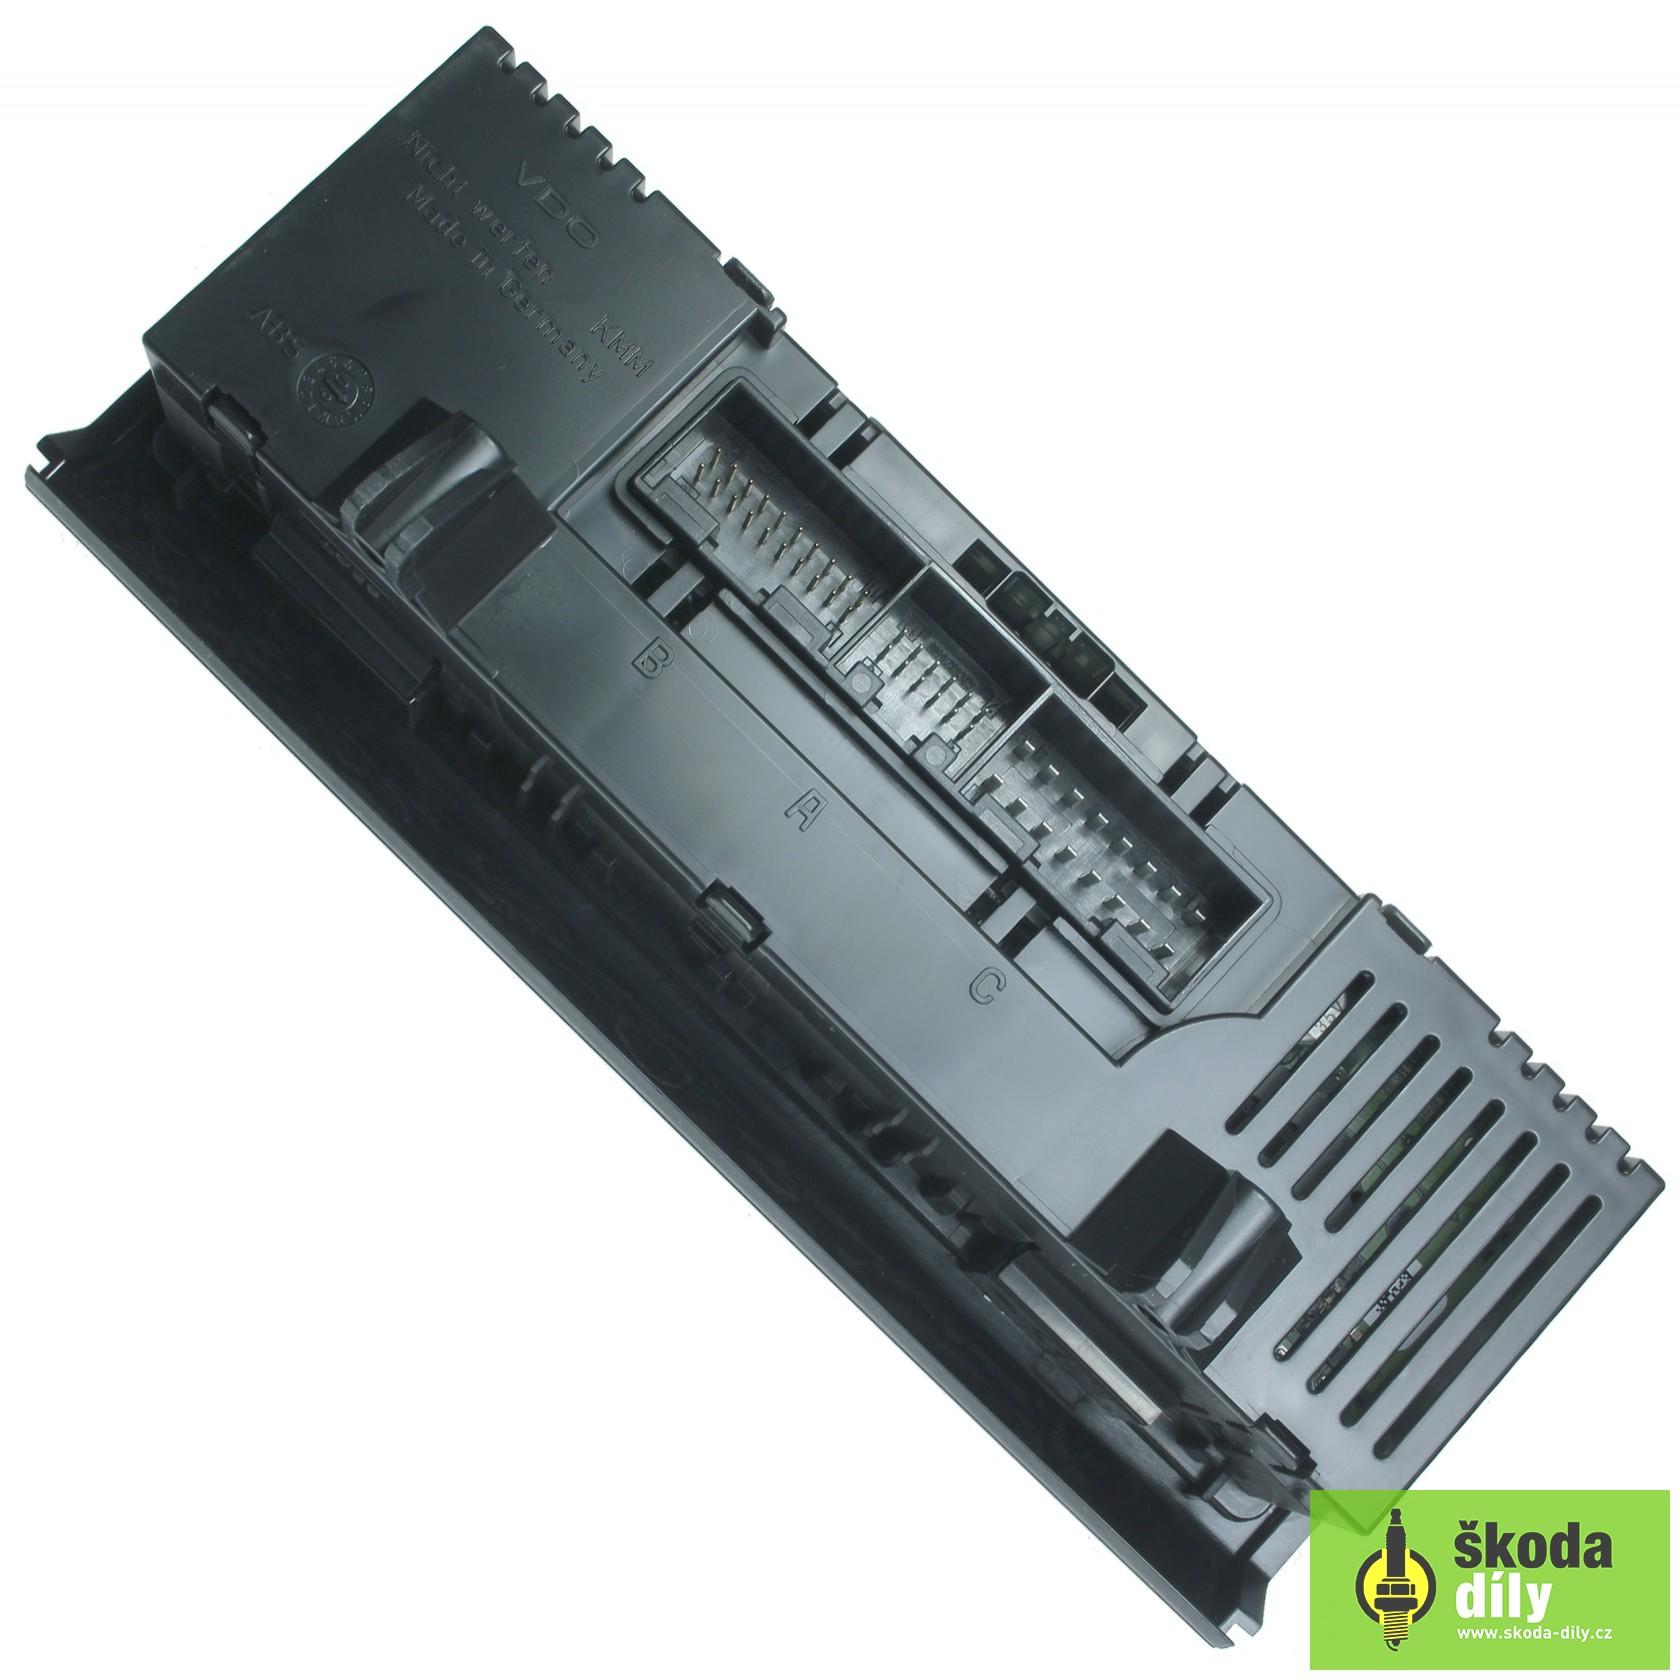 Climatronic Control Panel Škoda